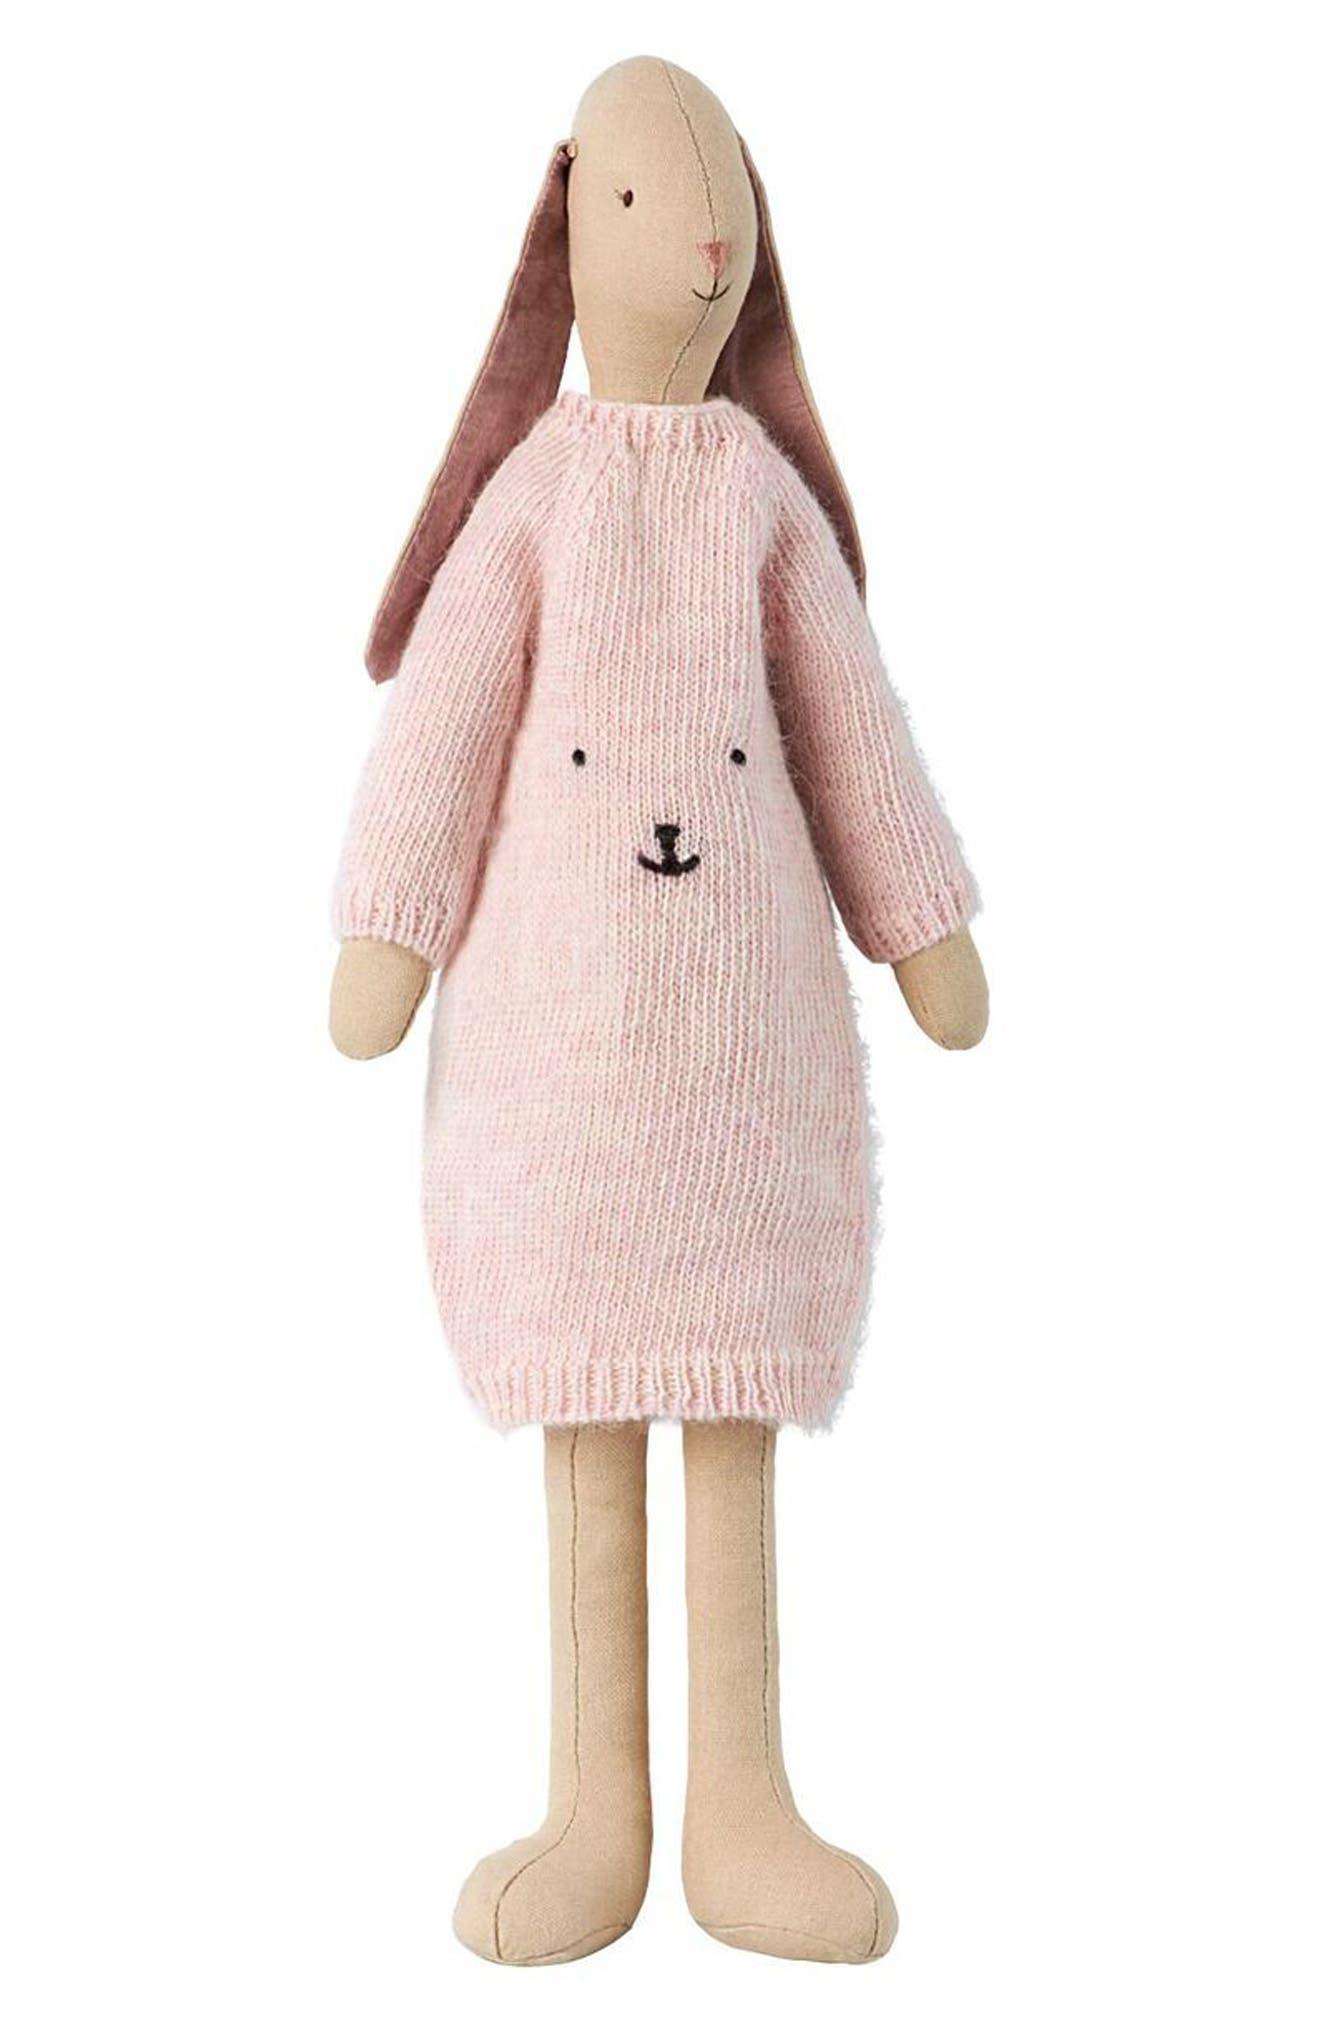 Alternate Image 1 Selected - Maileg Sweater Bunny Stuffed Animal